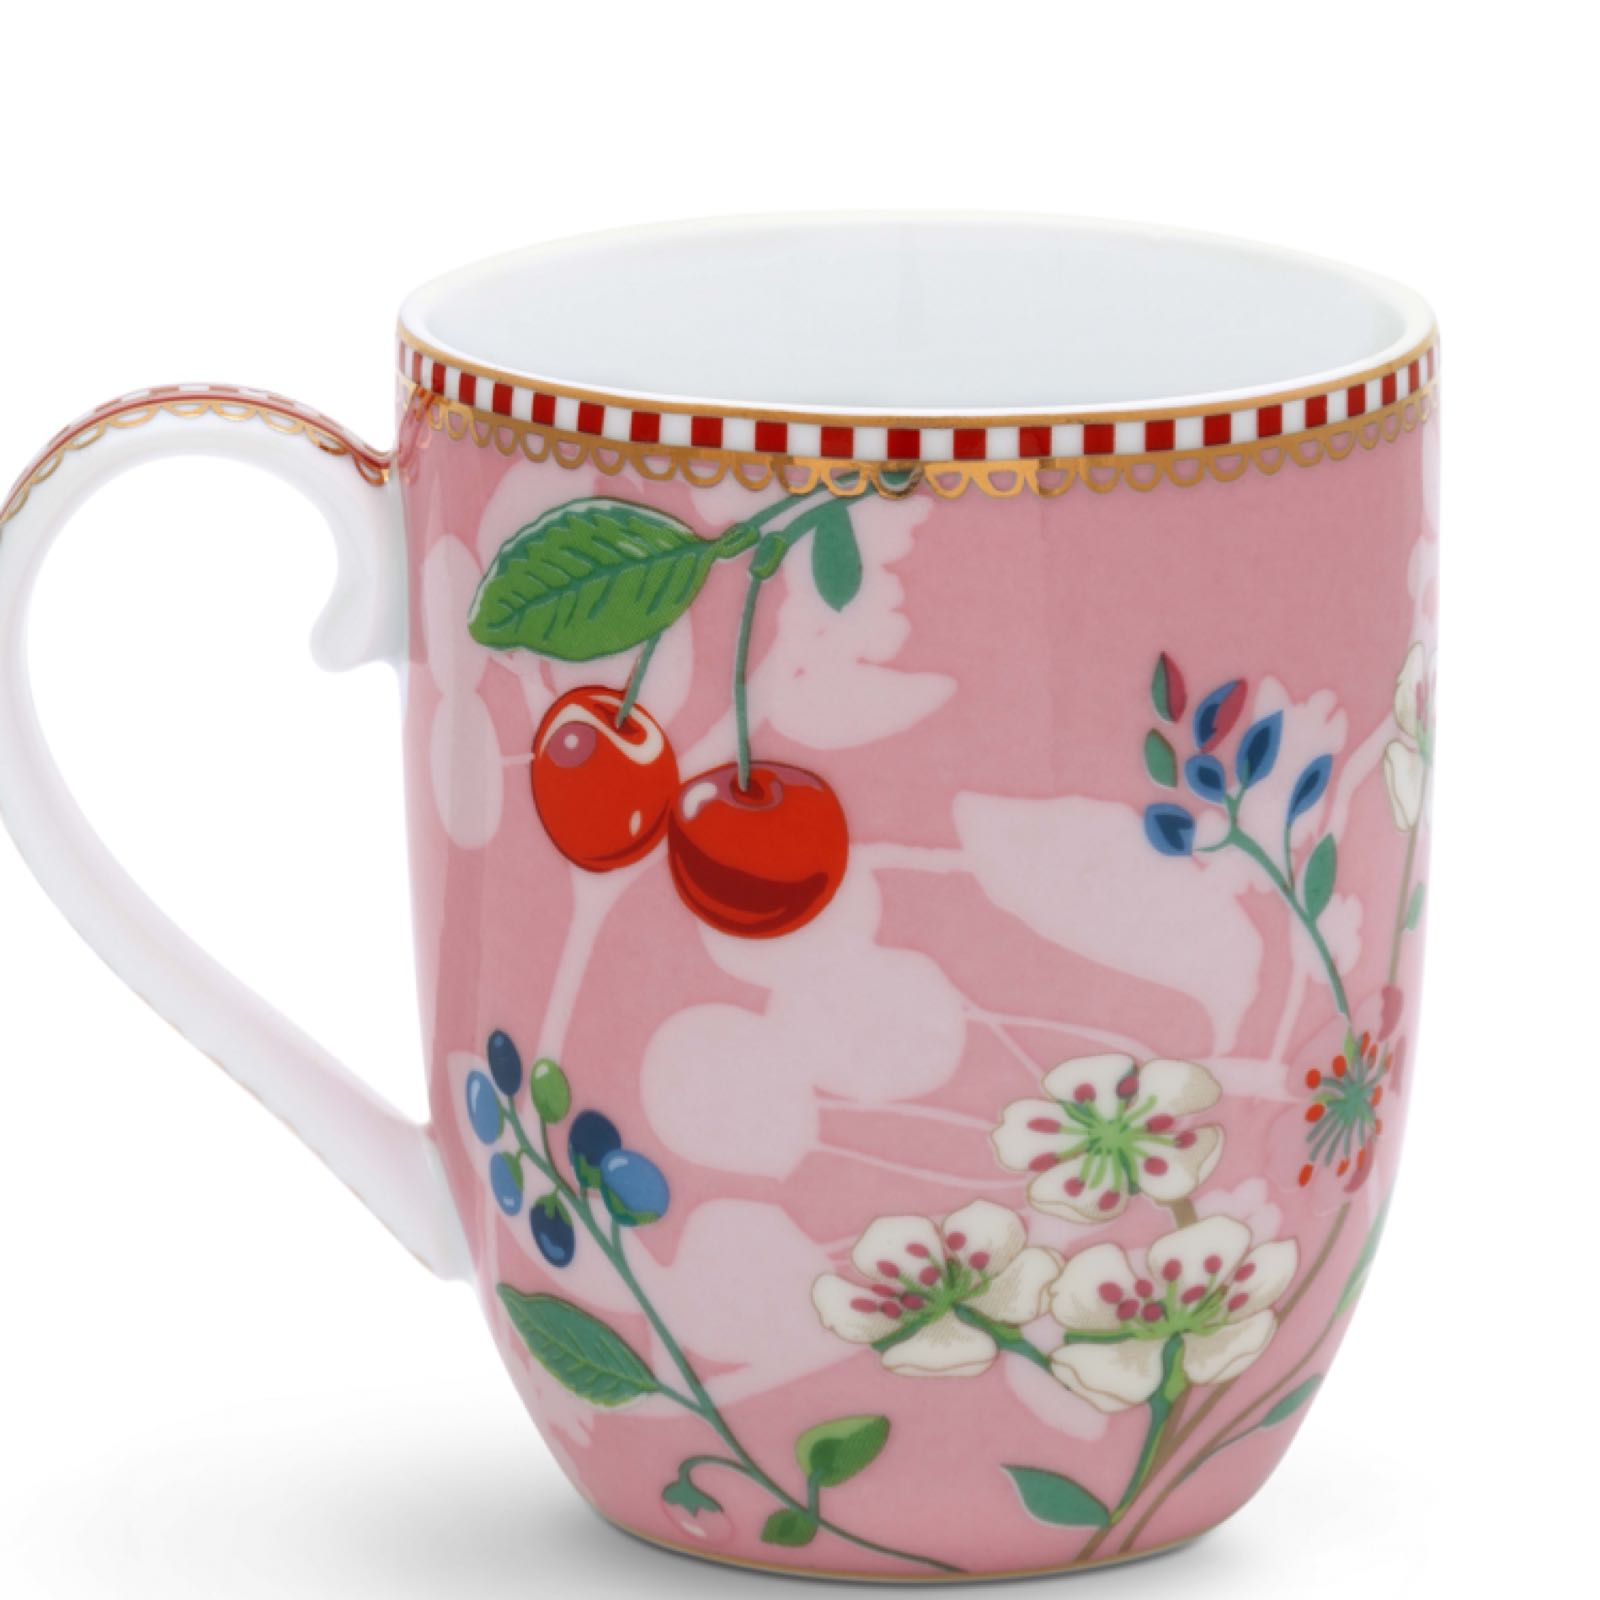 Pip studio small hummingbird mug pink